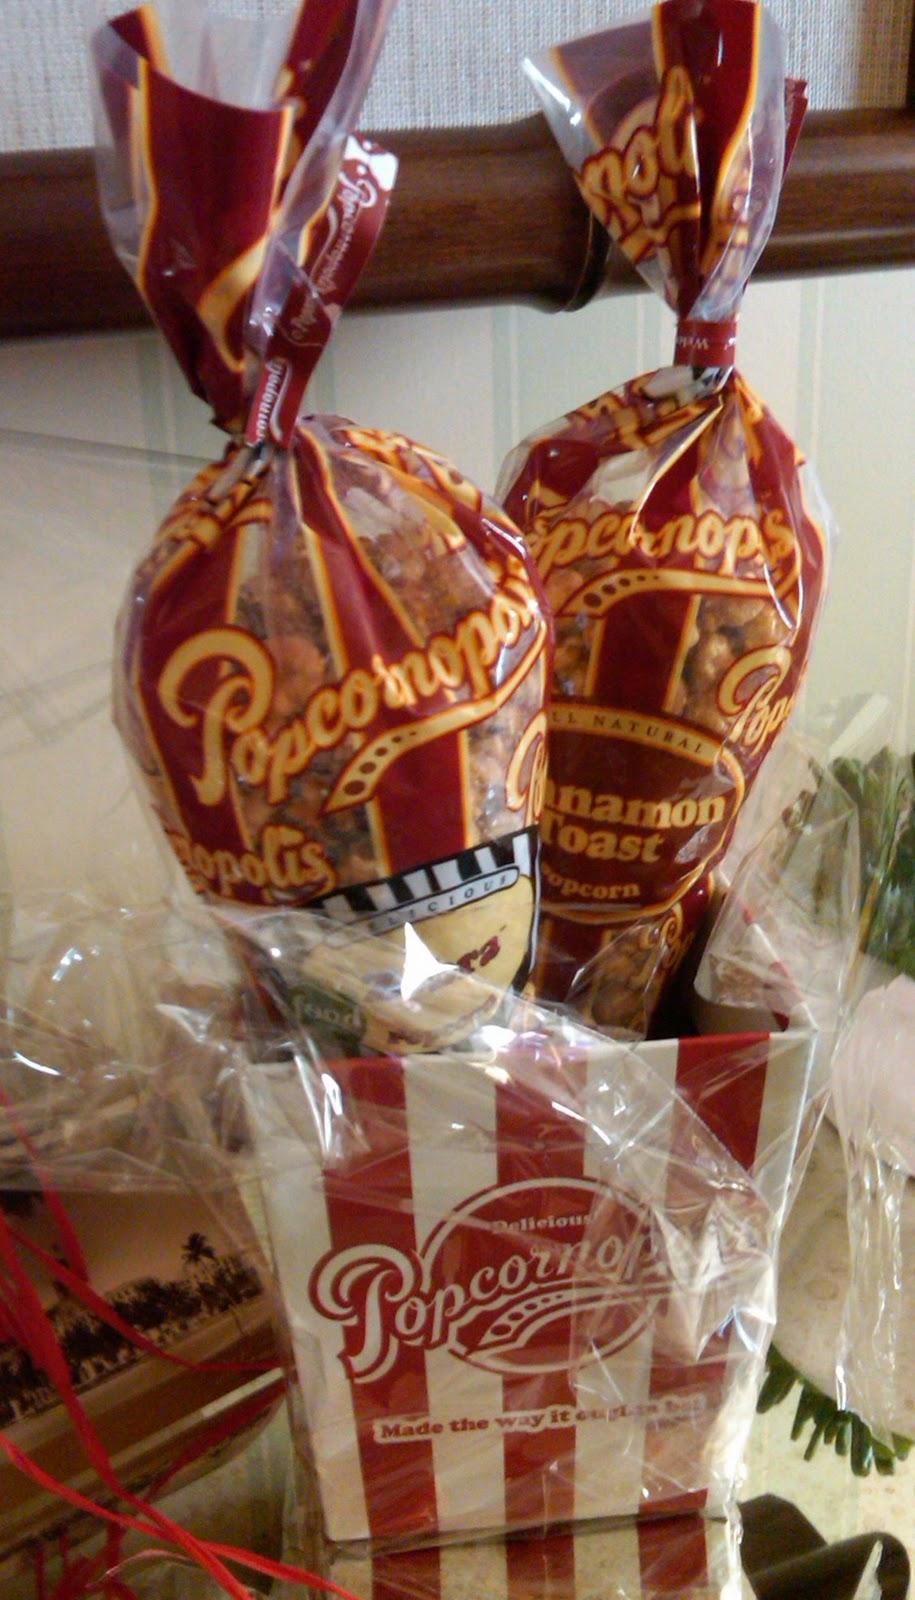 Goodie Goodie Gluten-Free: Popcornopolis